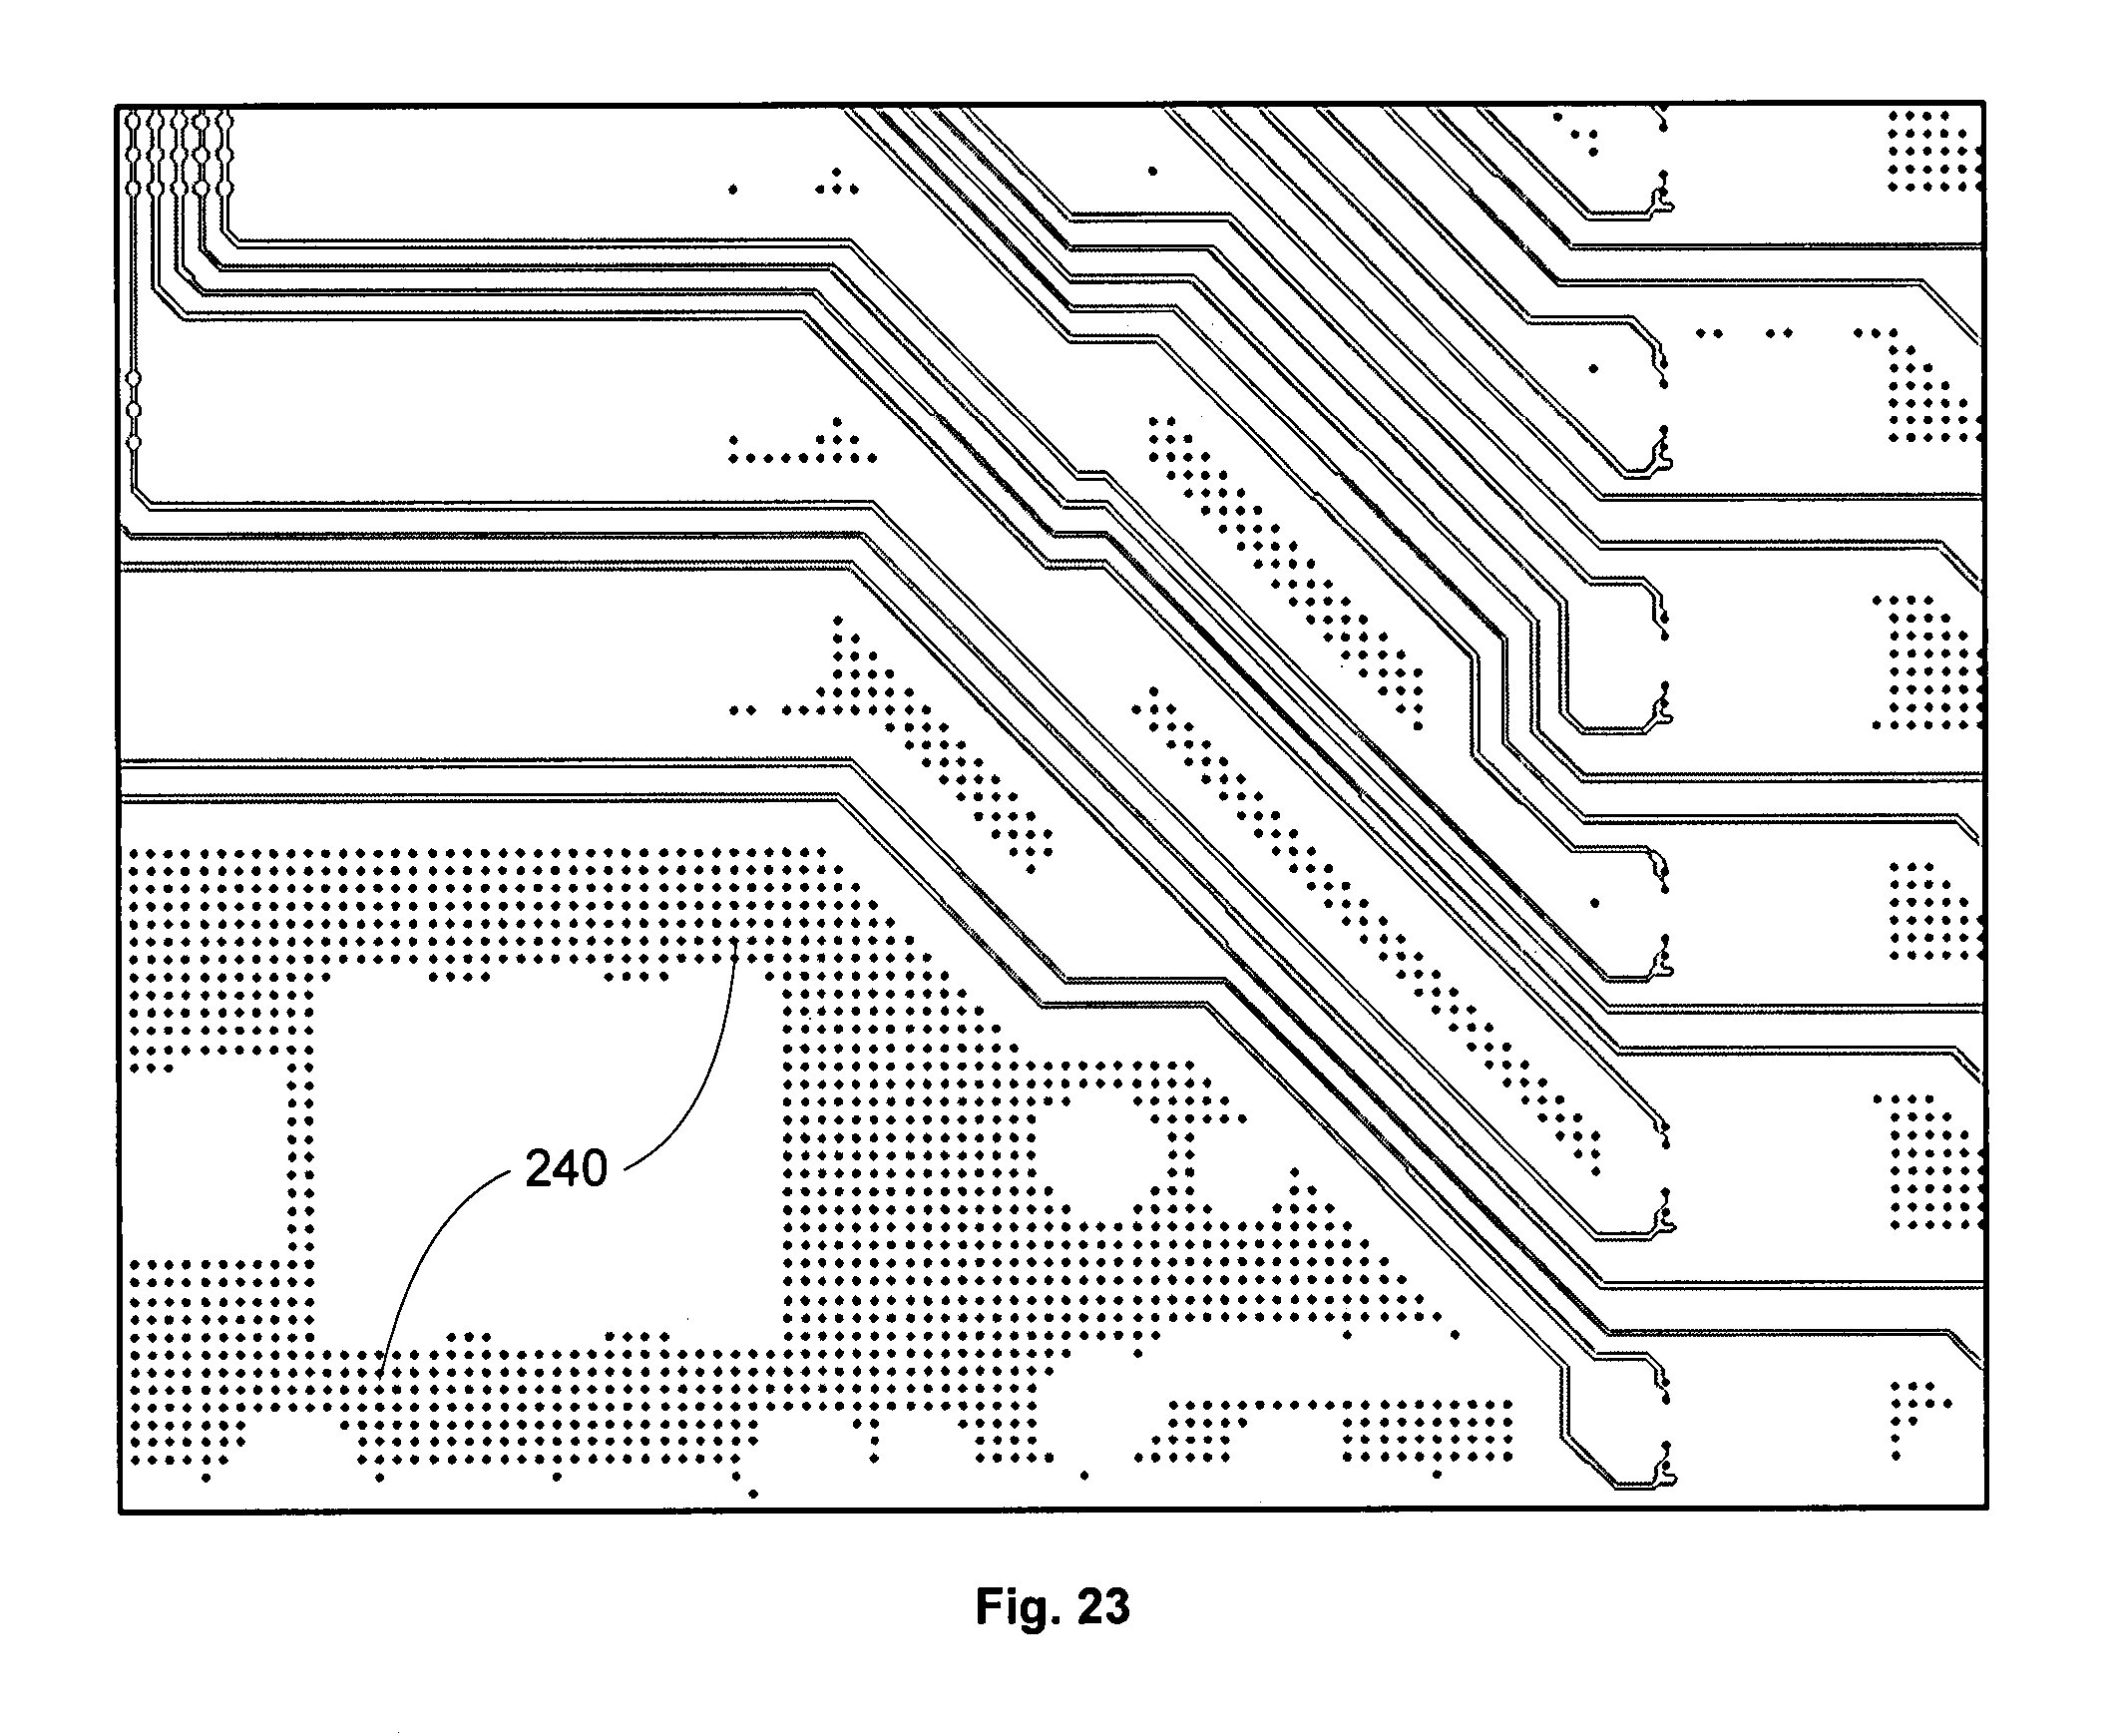 patente us7615709